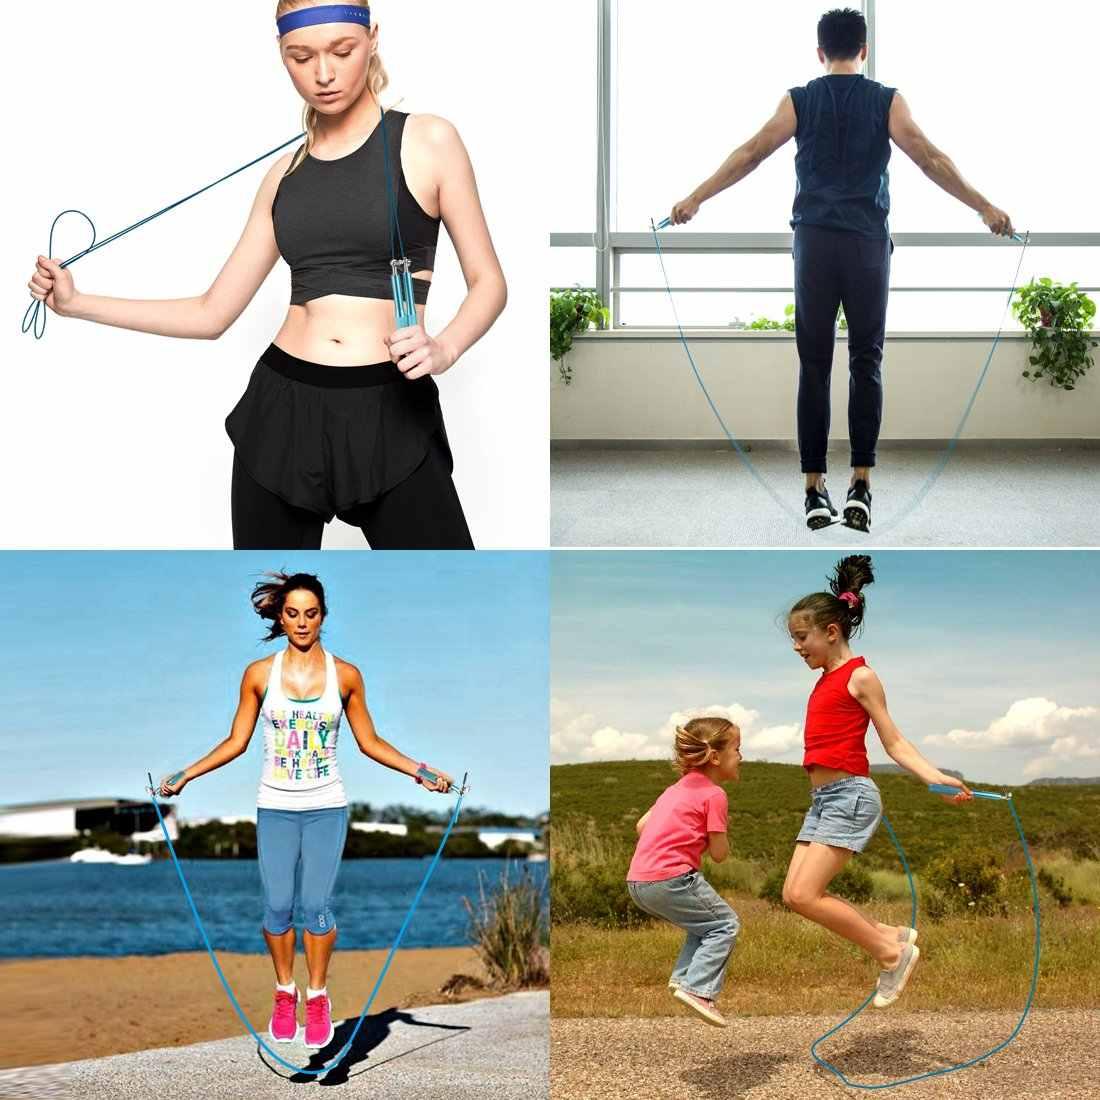 Kebugaran Lompat Tali Latihan Latihan Ringan Bantalan Lompat Tali Logam Kecepatan CrossFit Gym MMA Latihan Orang Dewasa Anak Peralatan